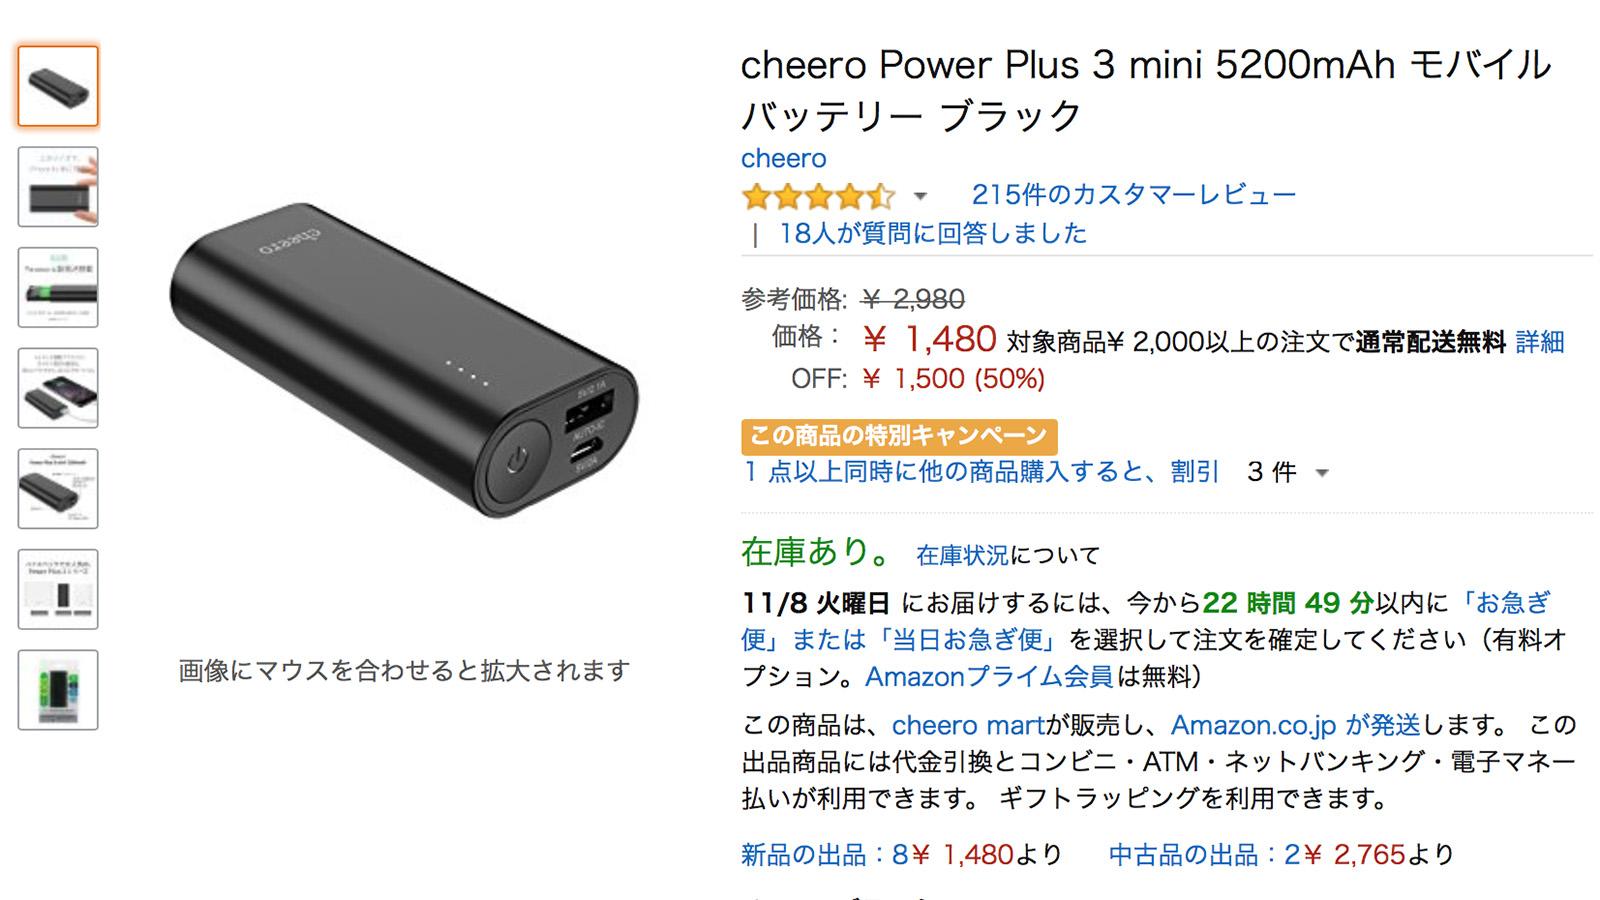 cheero Power Plus 3 mini 5200mAh 価格